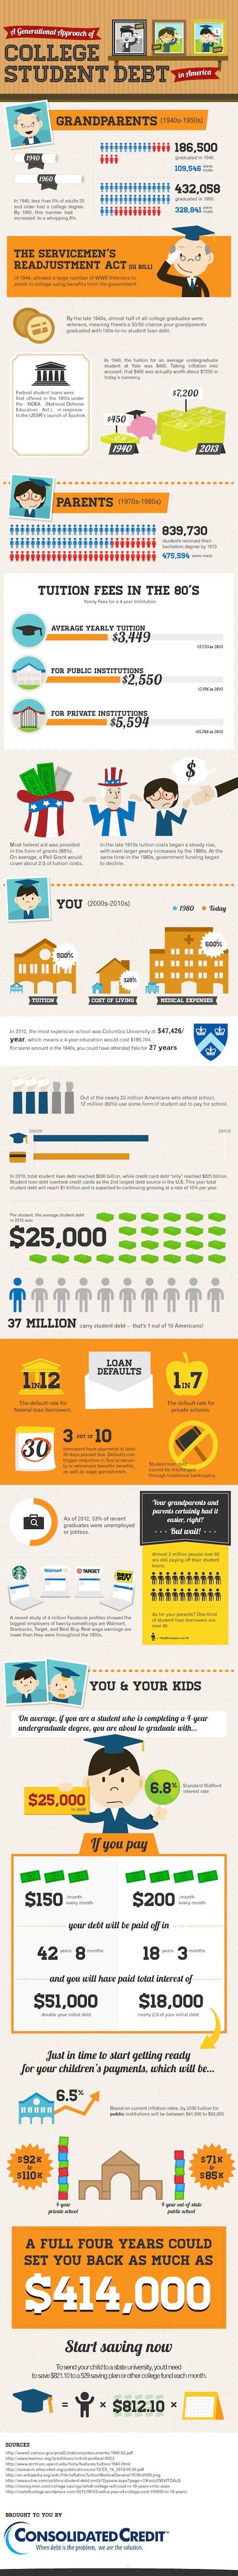 Generation Gap in Student Debt